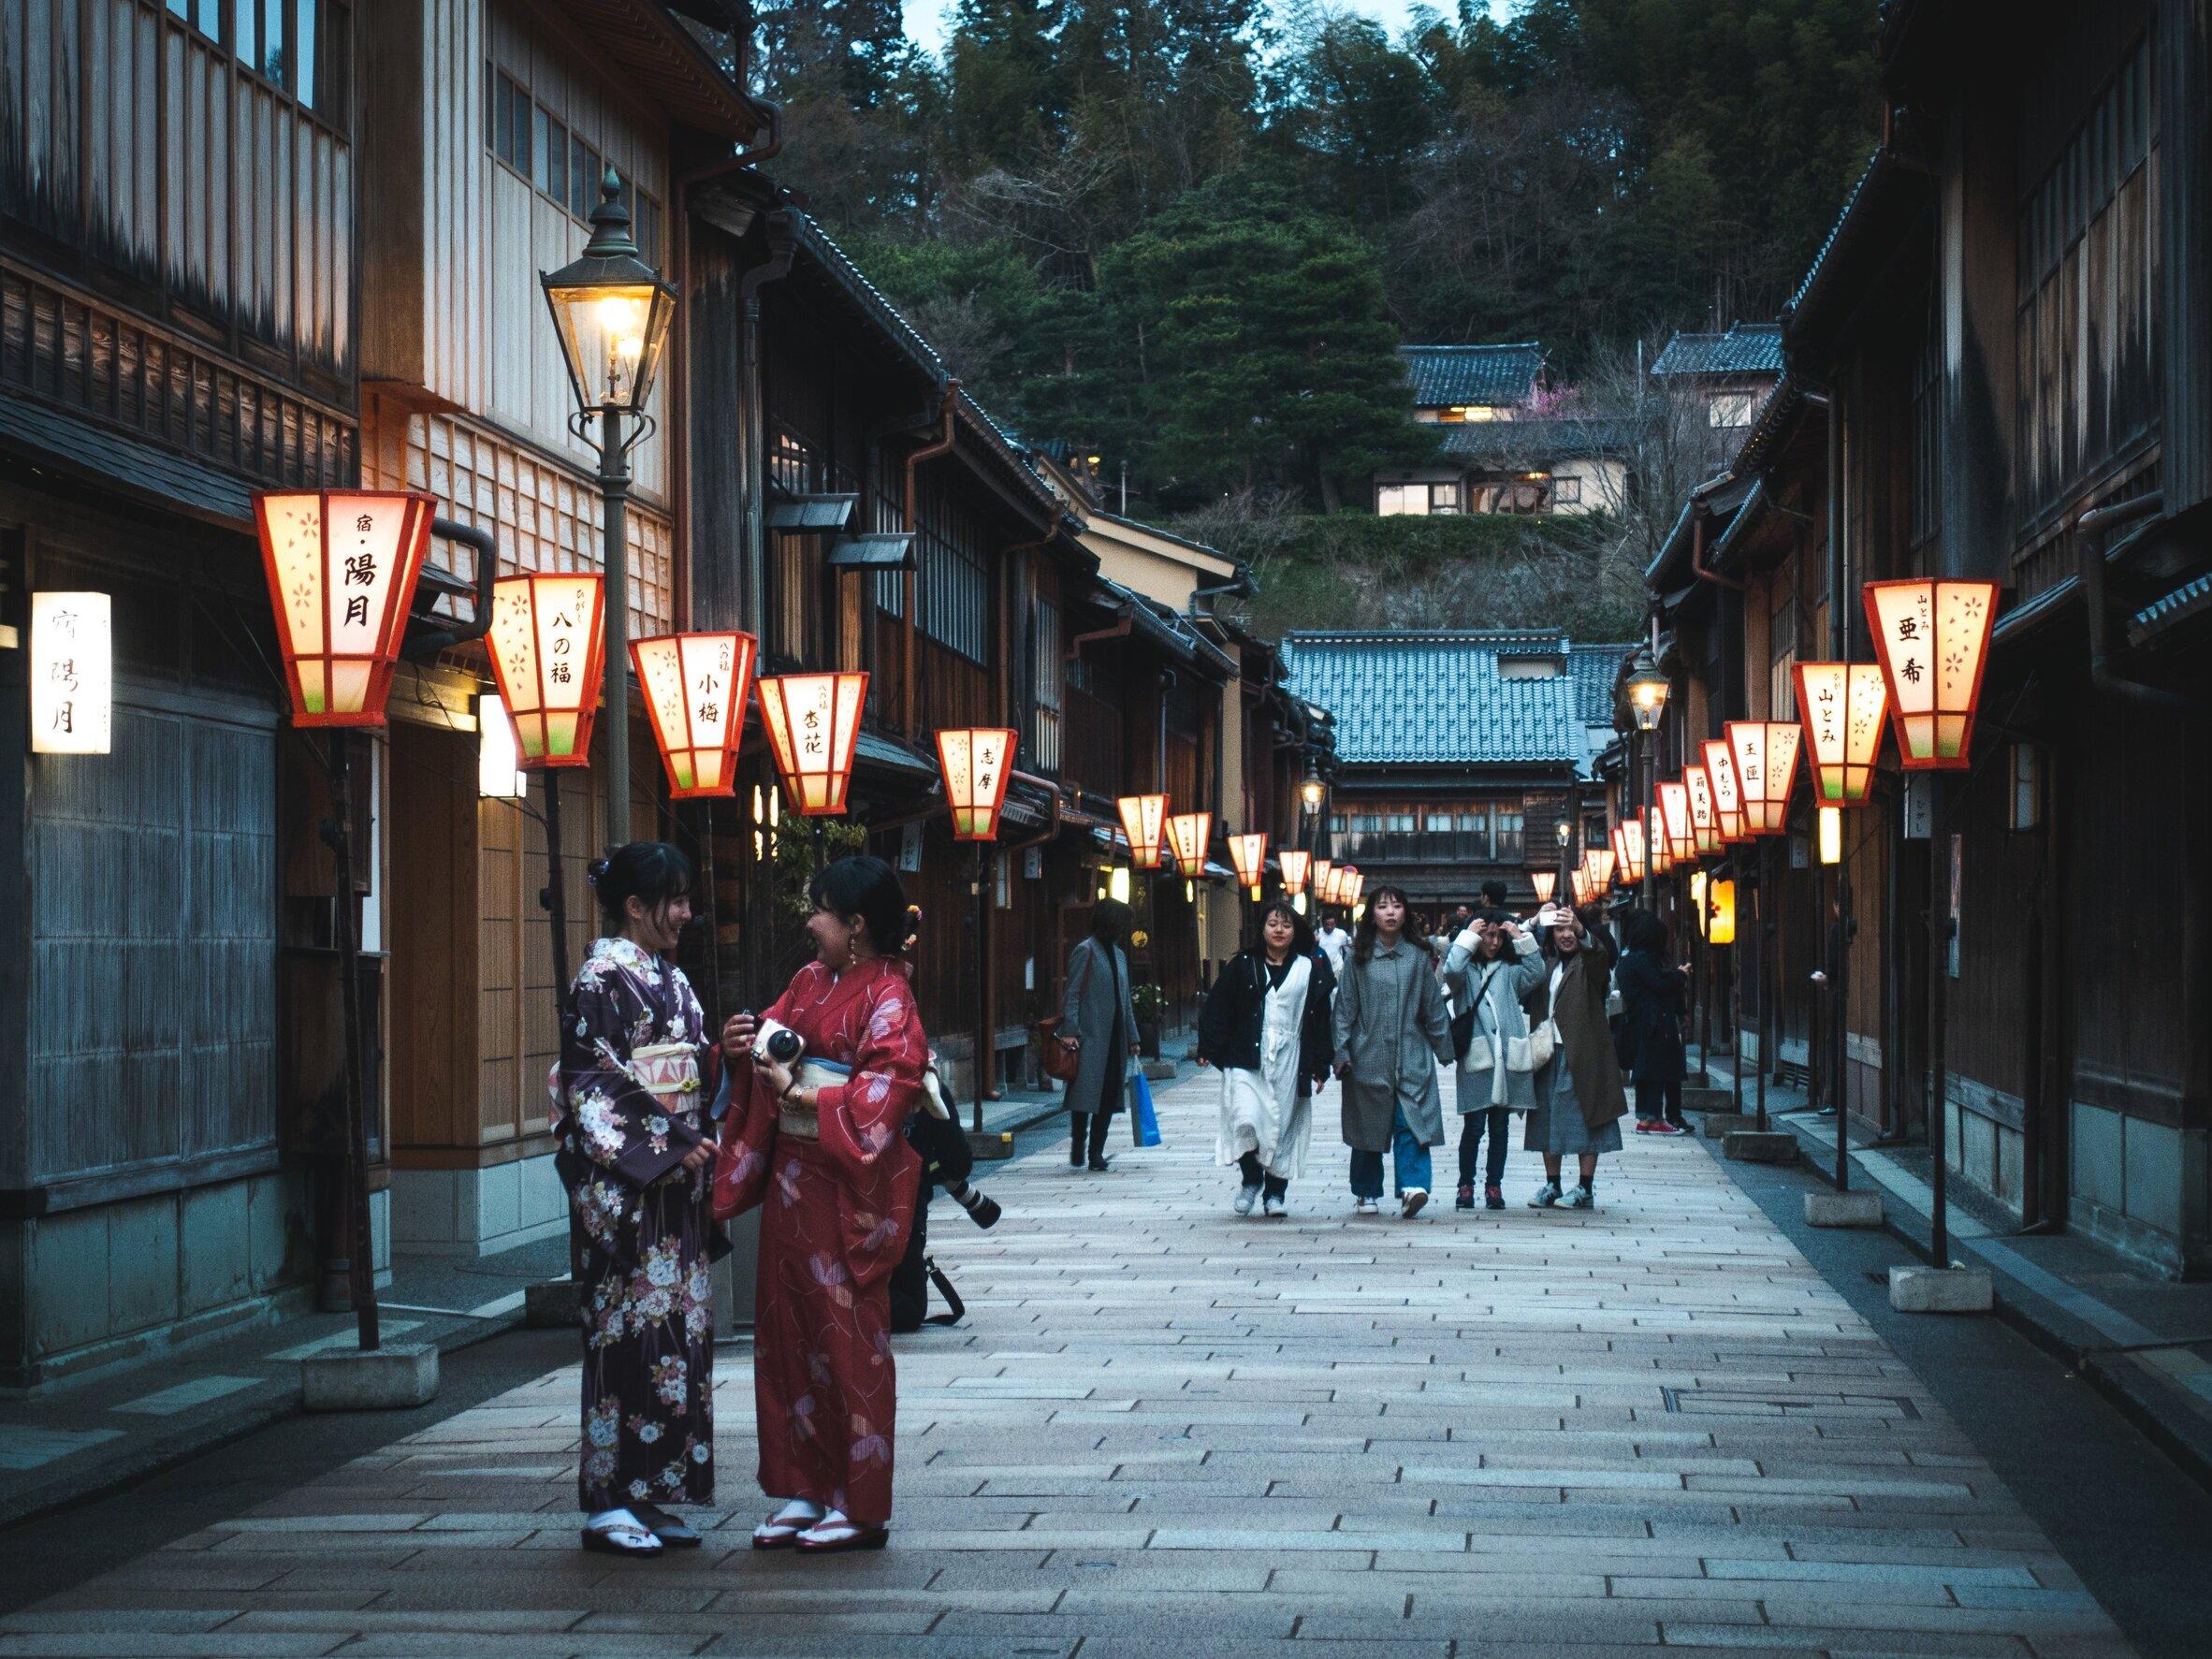 Kanazawa was easily one of my favorite cities!